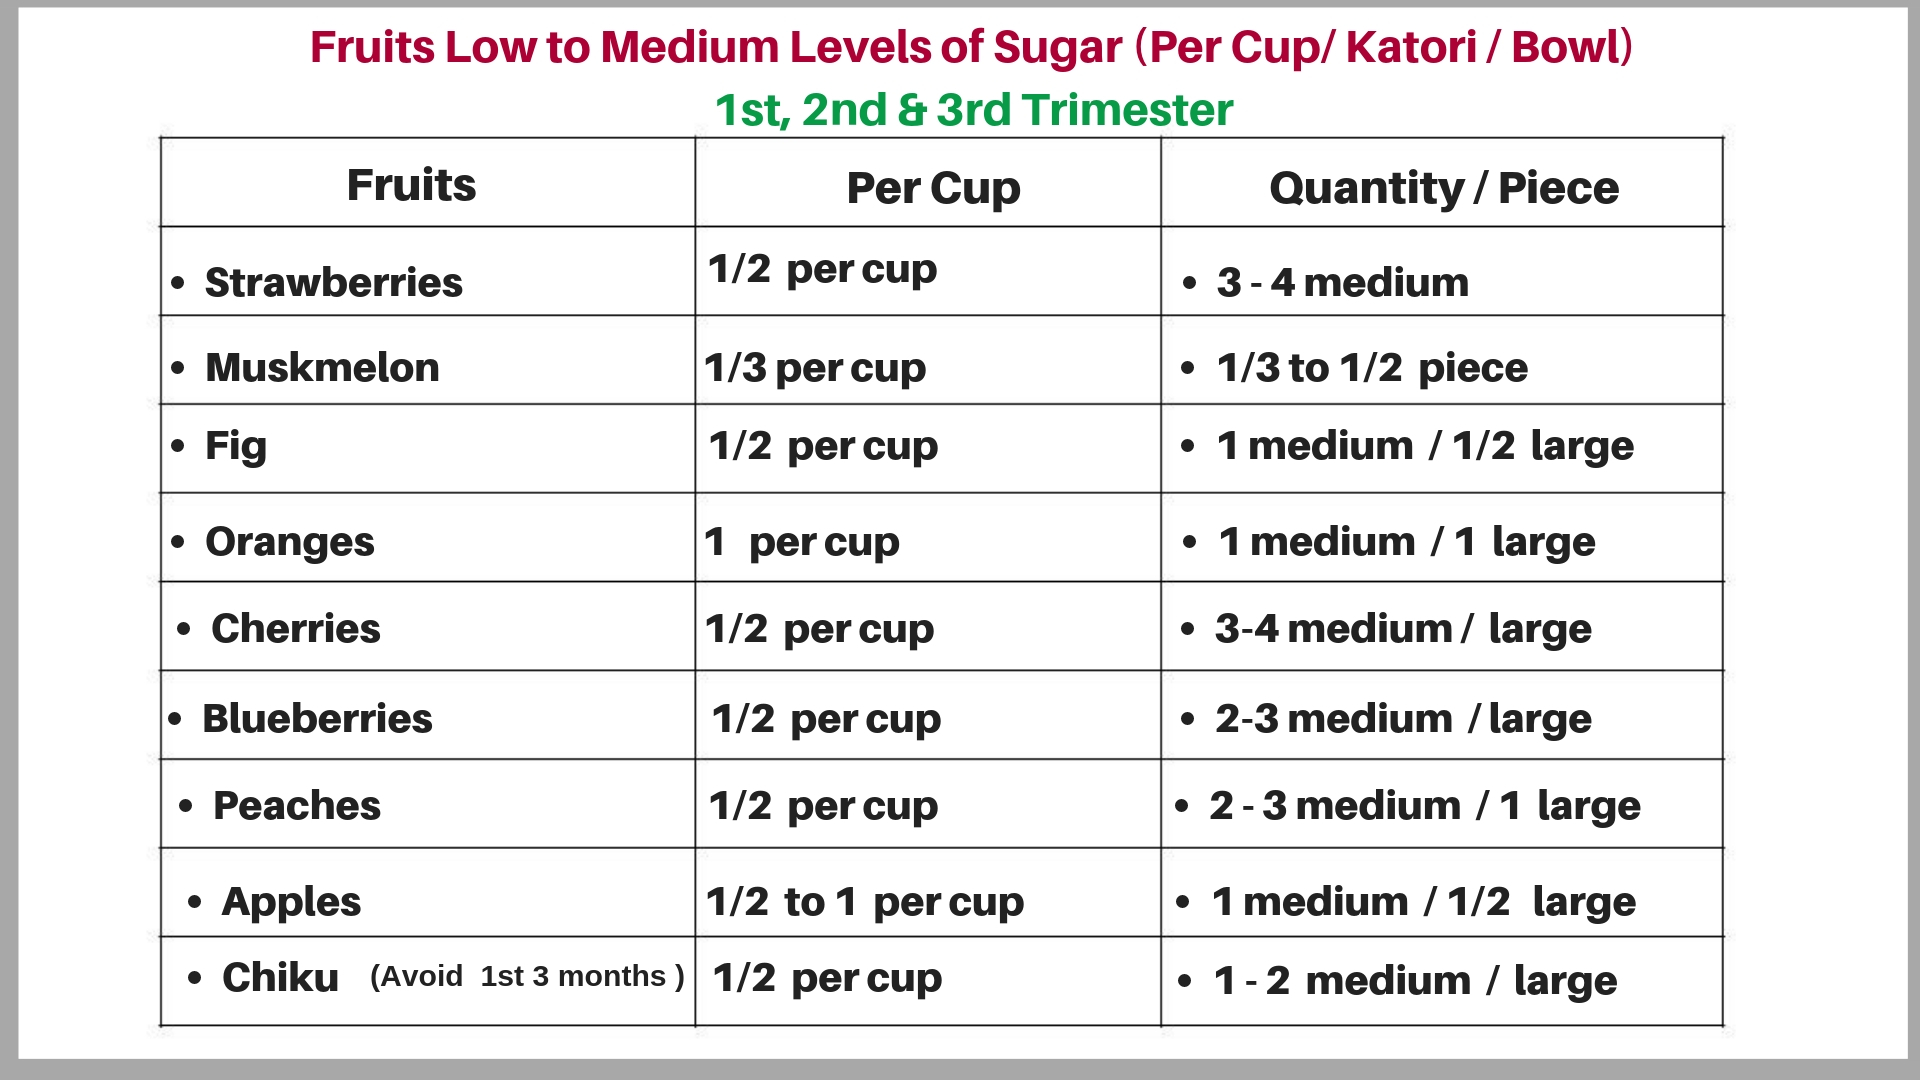 Fruits Low in Medium Levels of Sugar During Pregnancy By Shweta Sharma